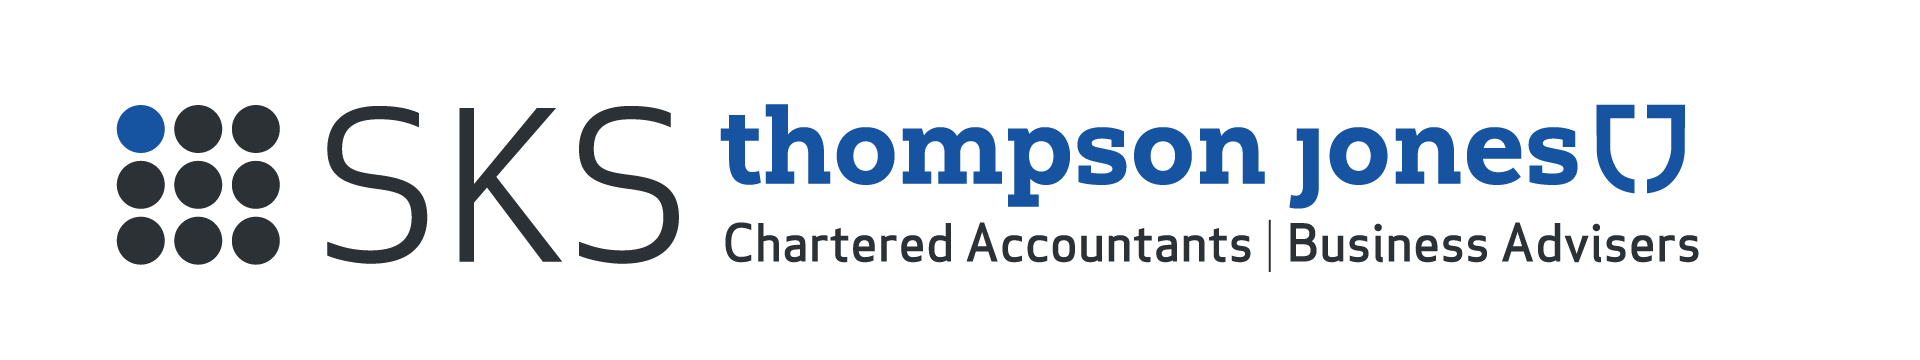 SKS_Brands_v9_SKS_ThomsonJones